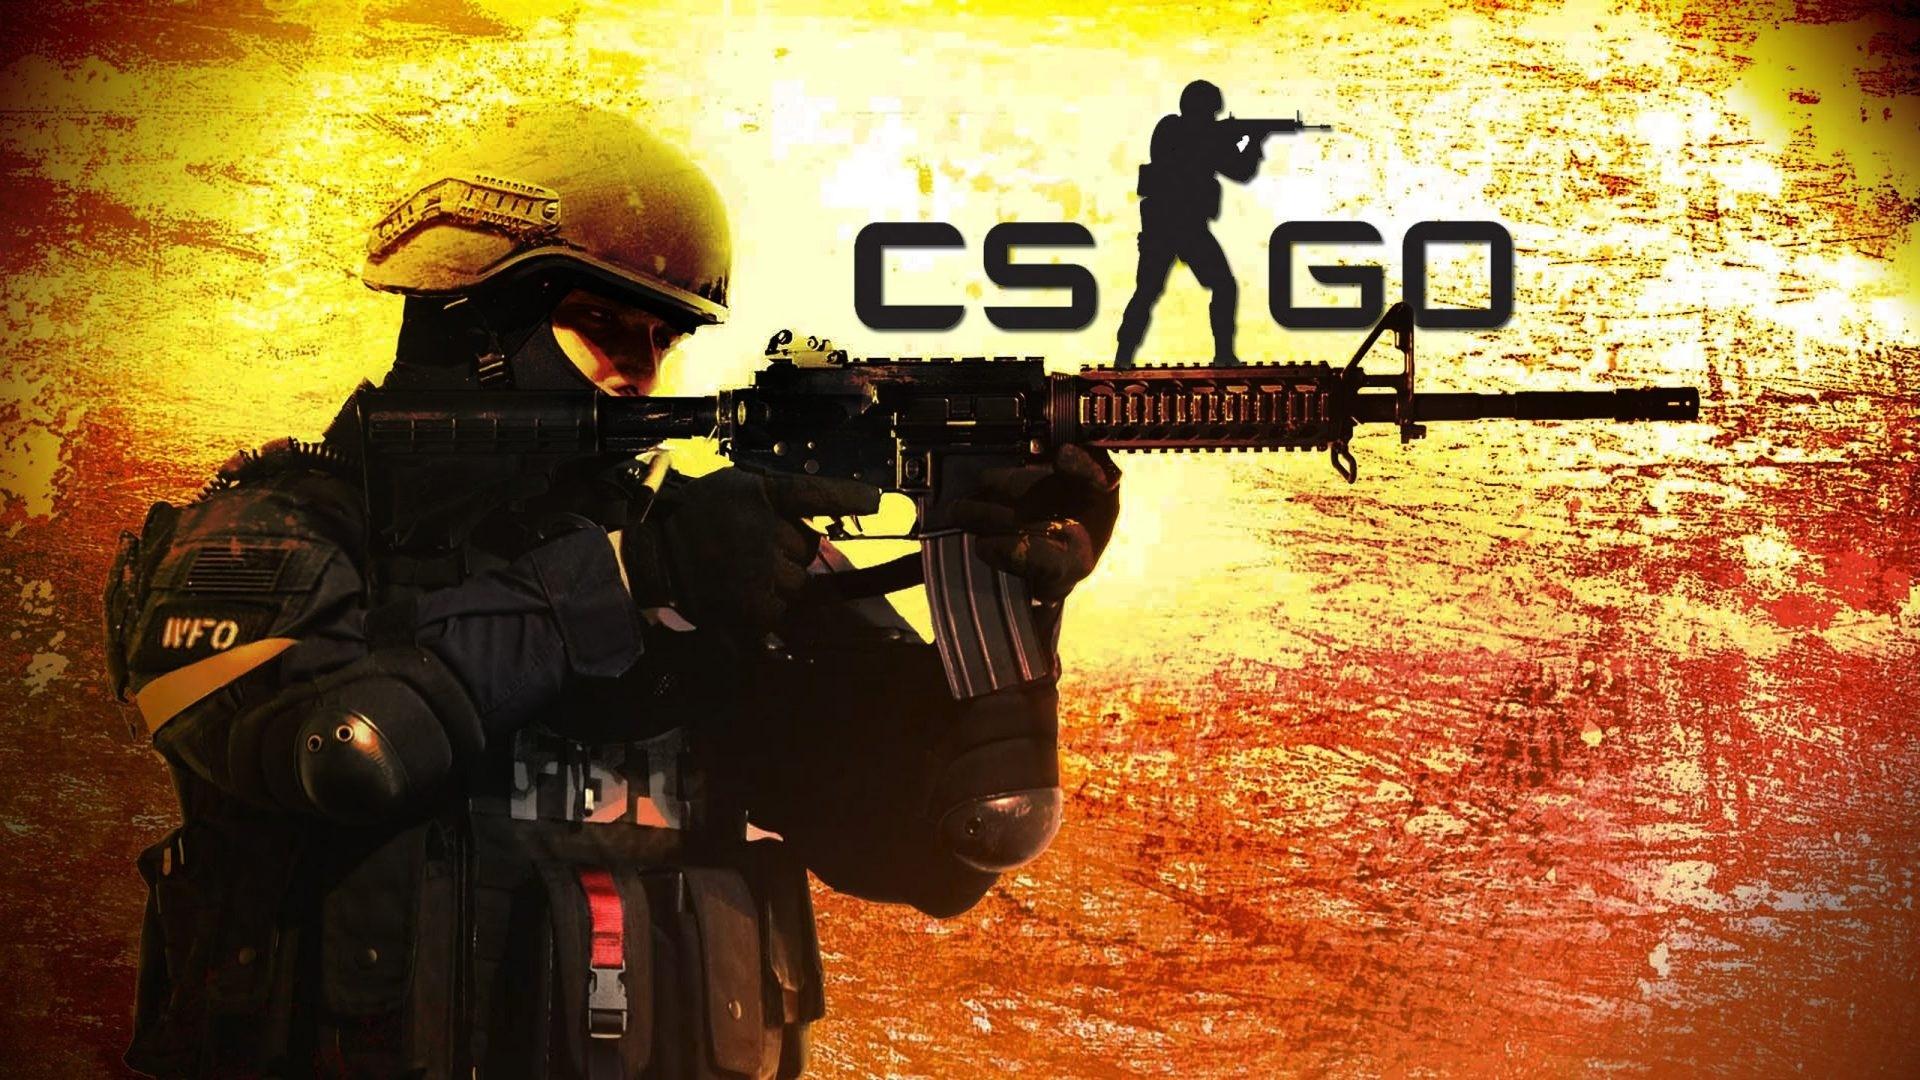 Csgo free background